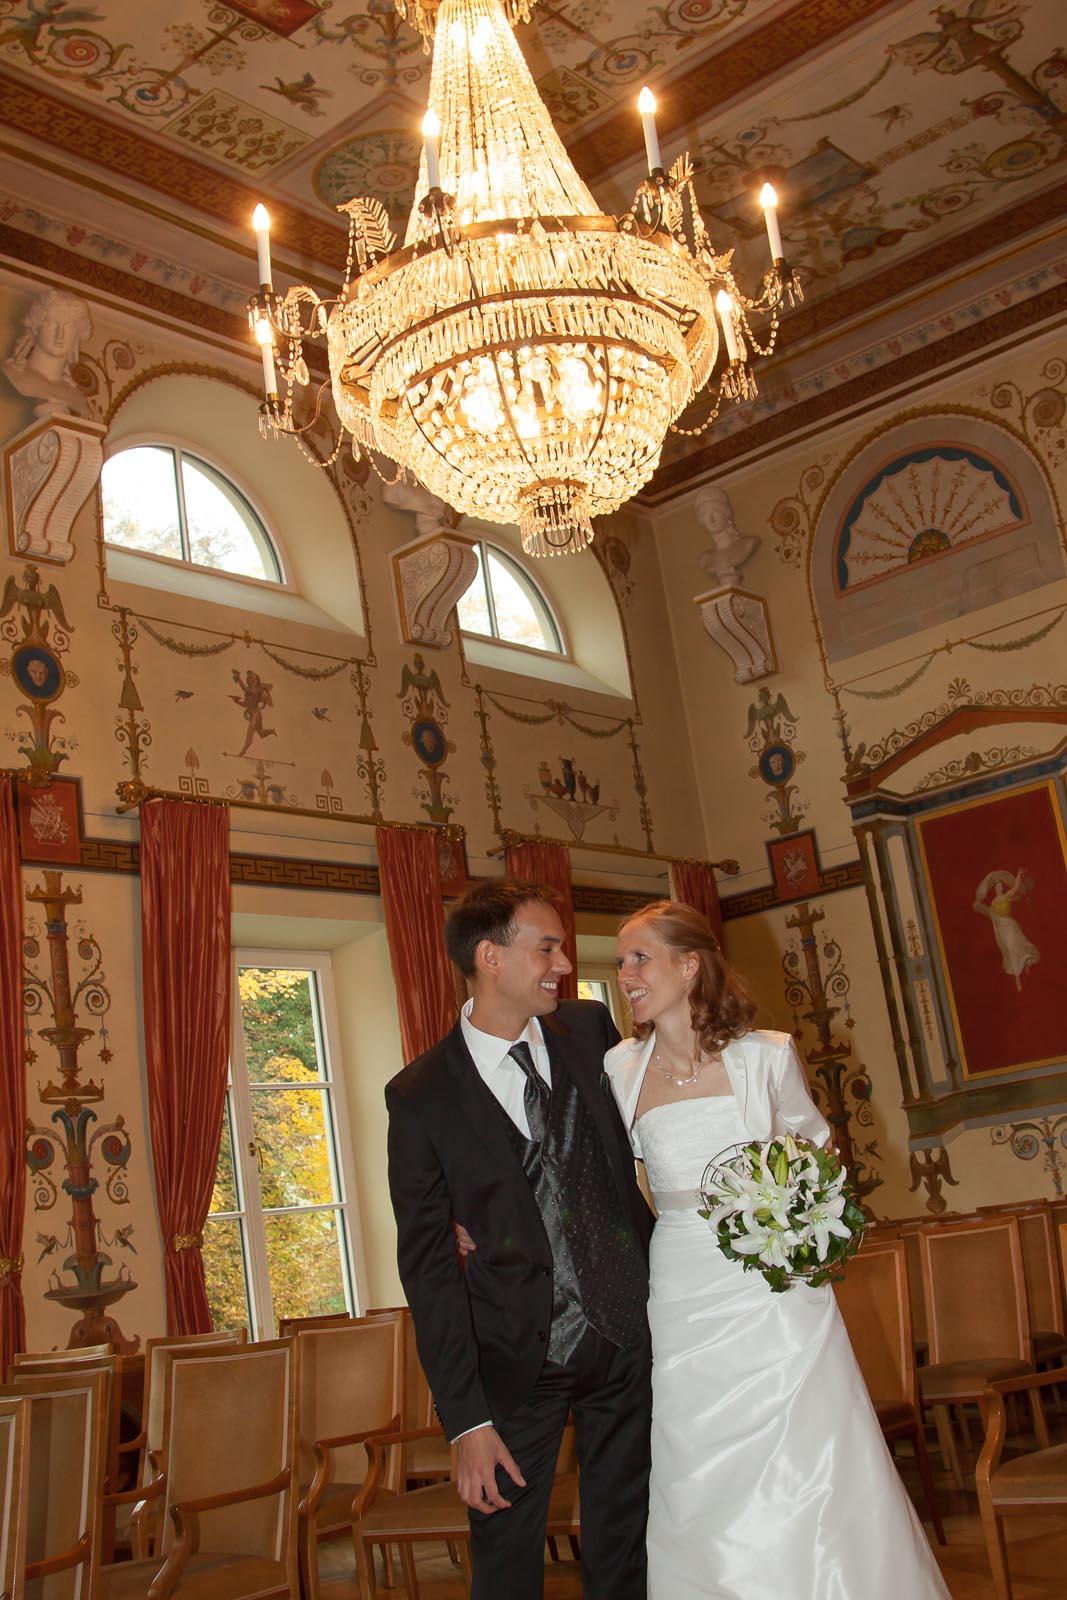 Hochzeitsportraits-Pohl-Pohler-Hochzeit-Pohl-Pohler-0227.jpg